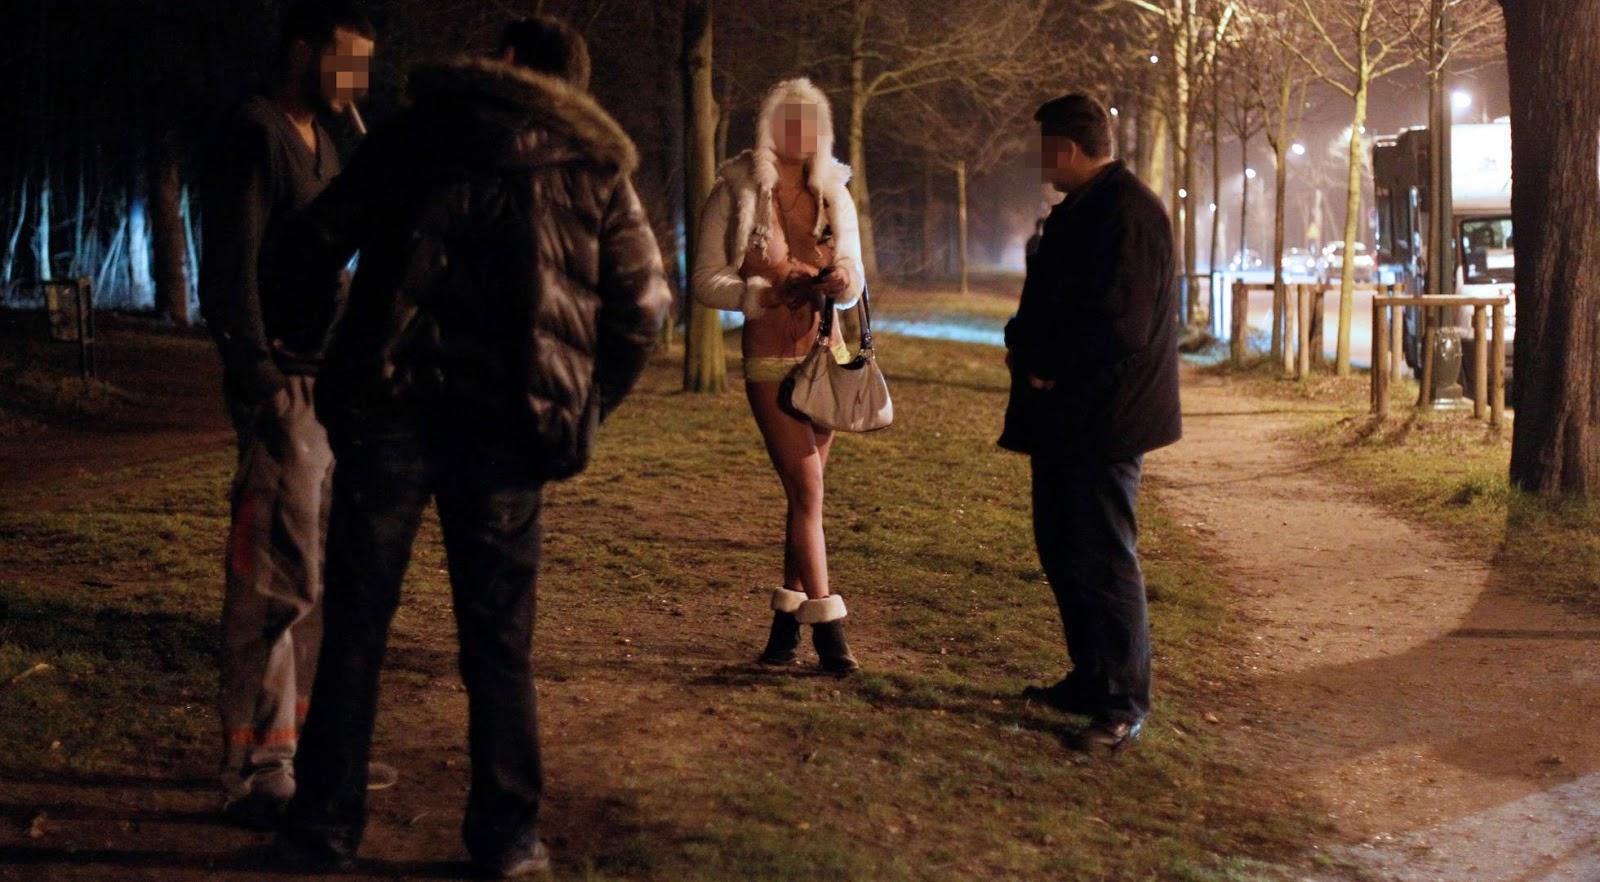 harrow-prostitute-harassment